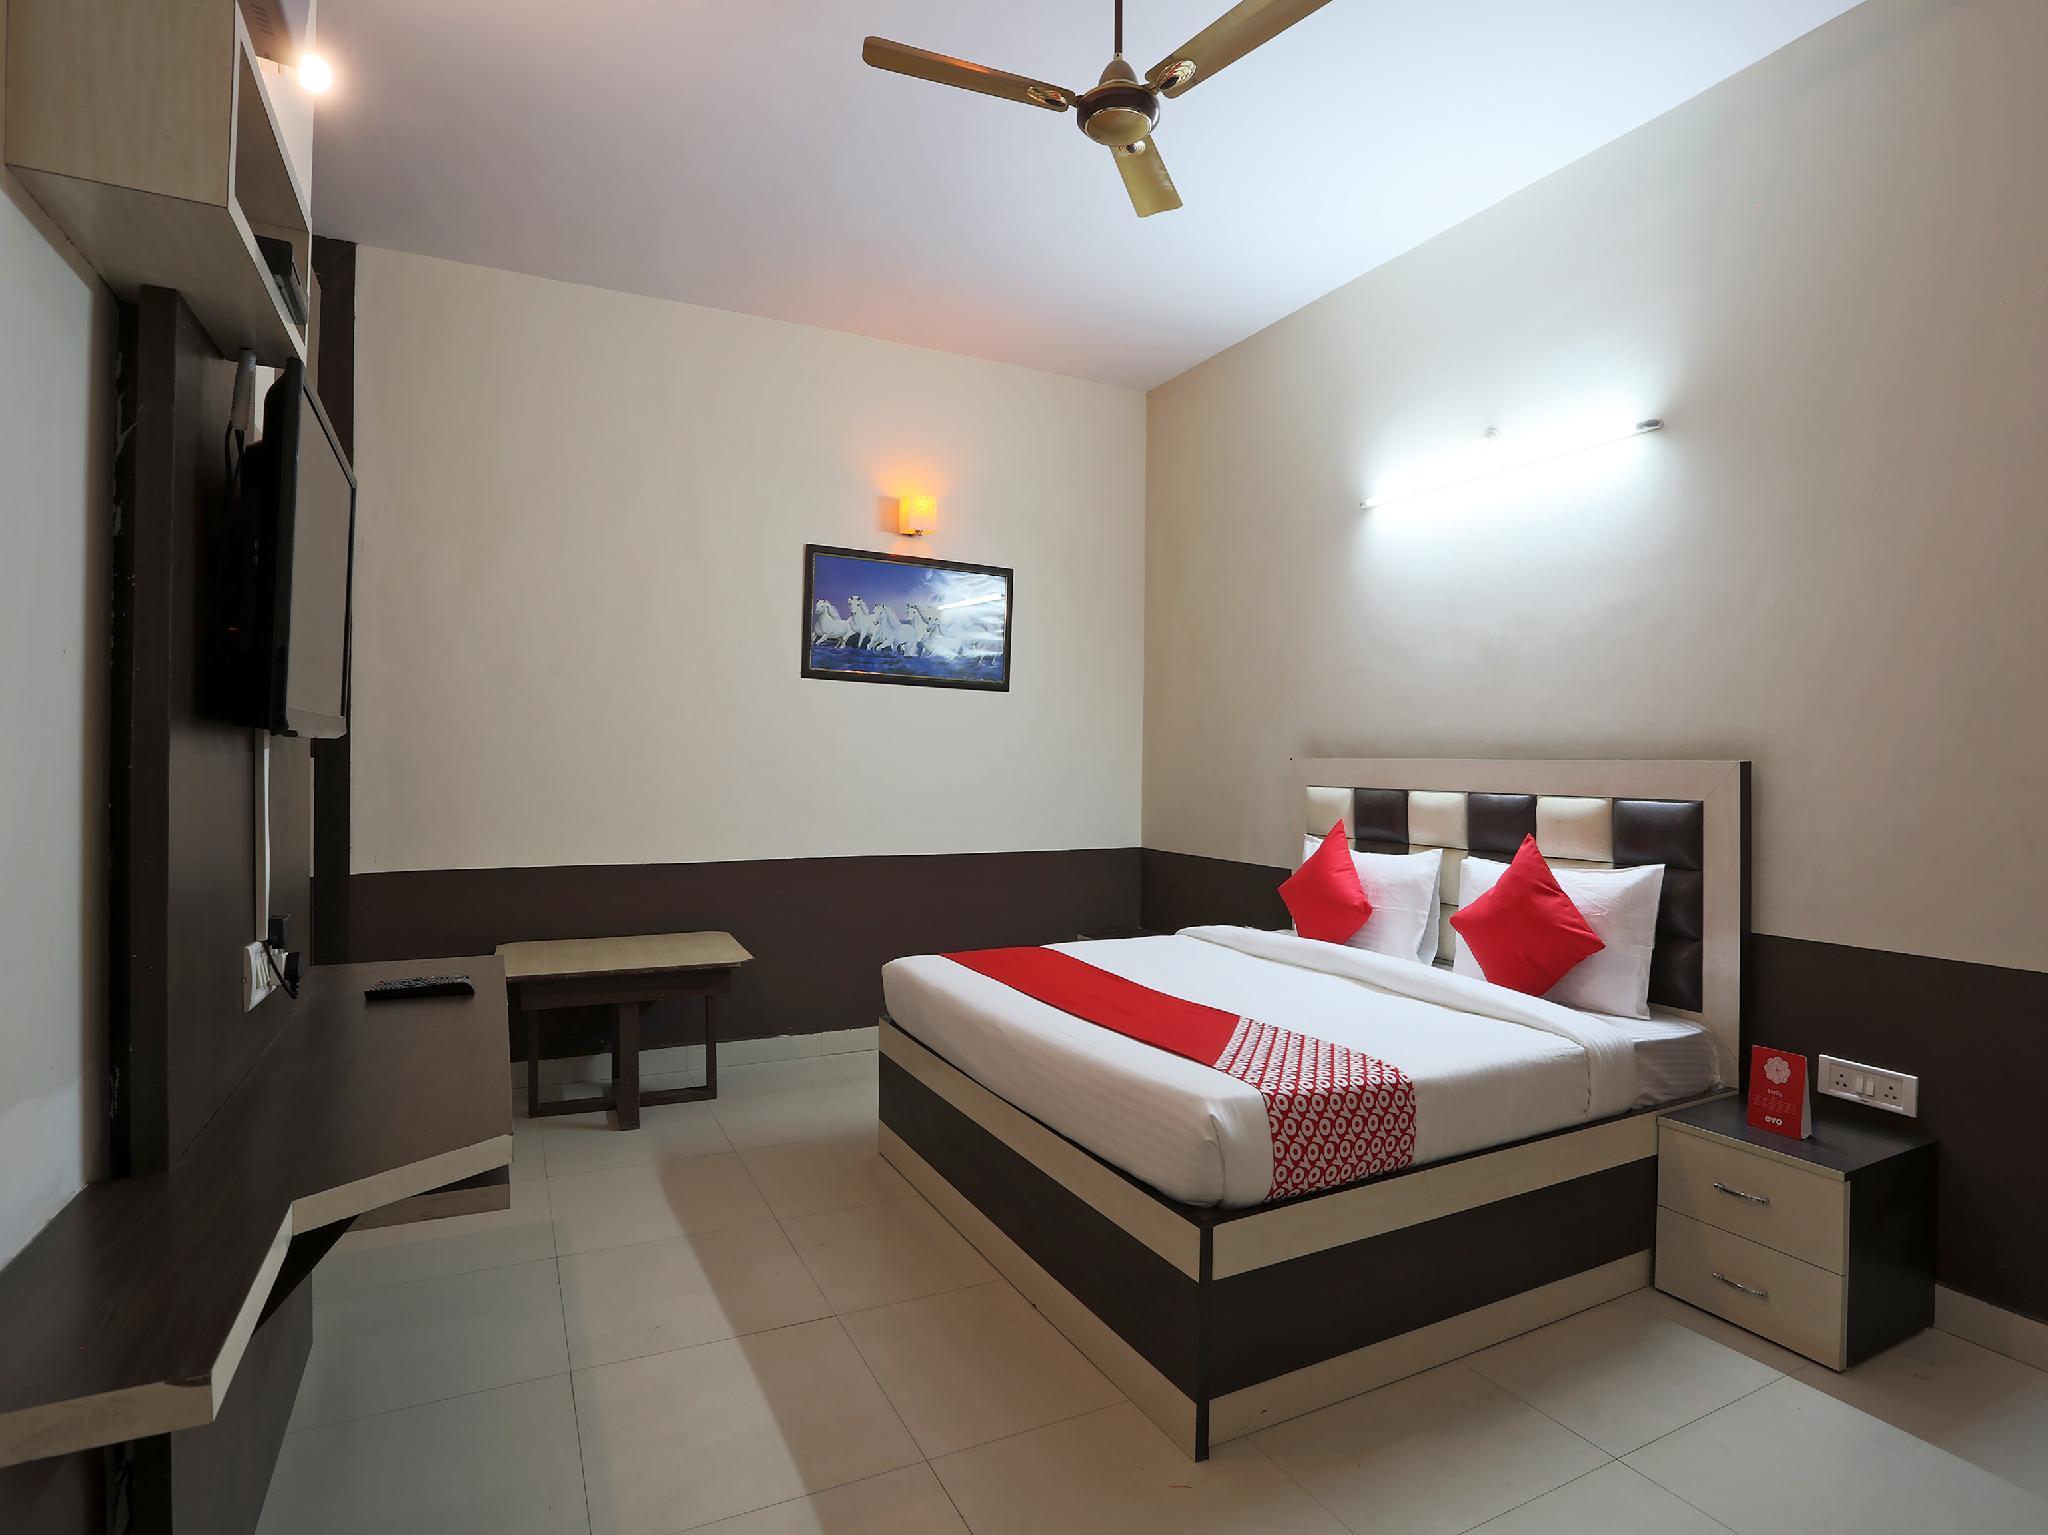 OYO 38077 hotel atithi, Rewari